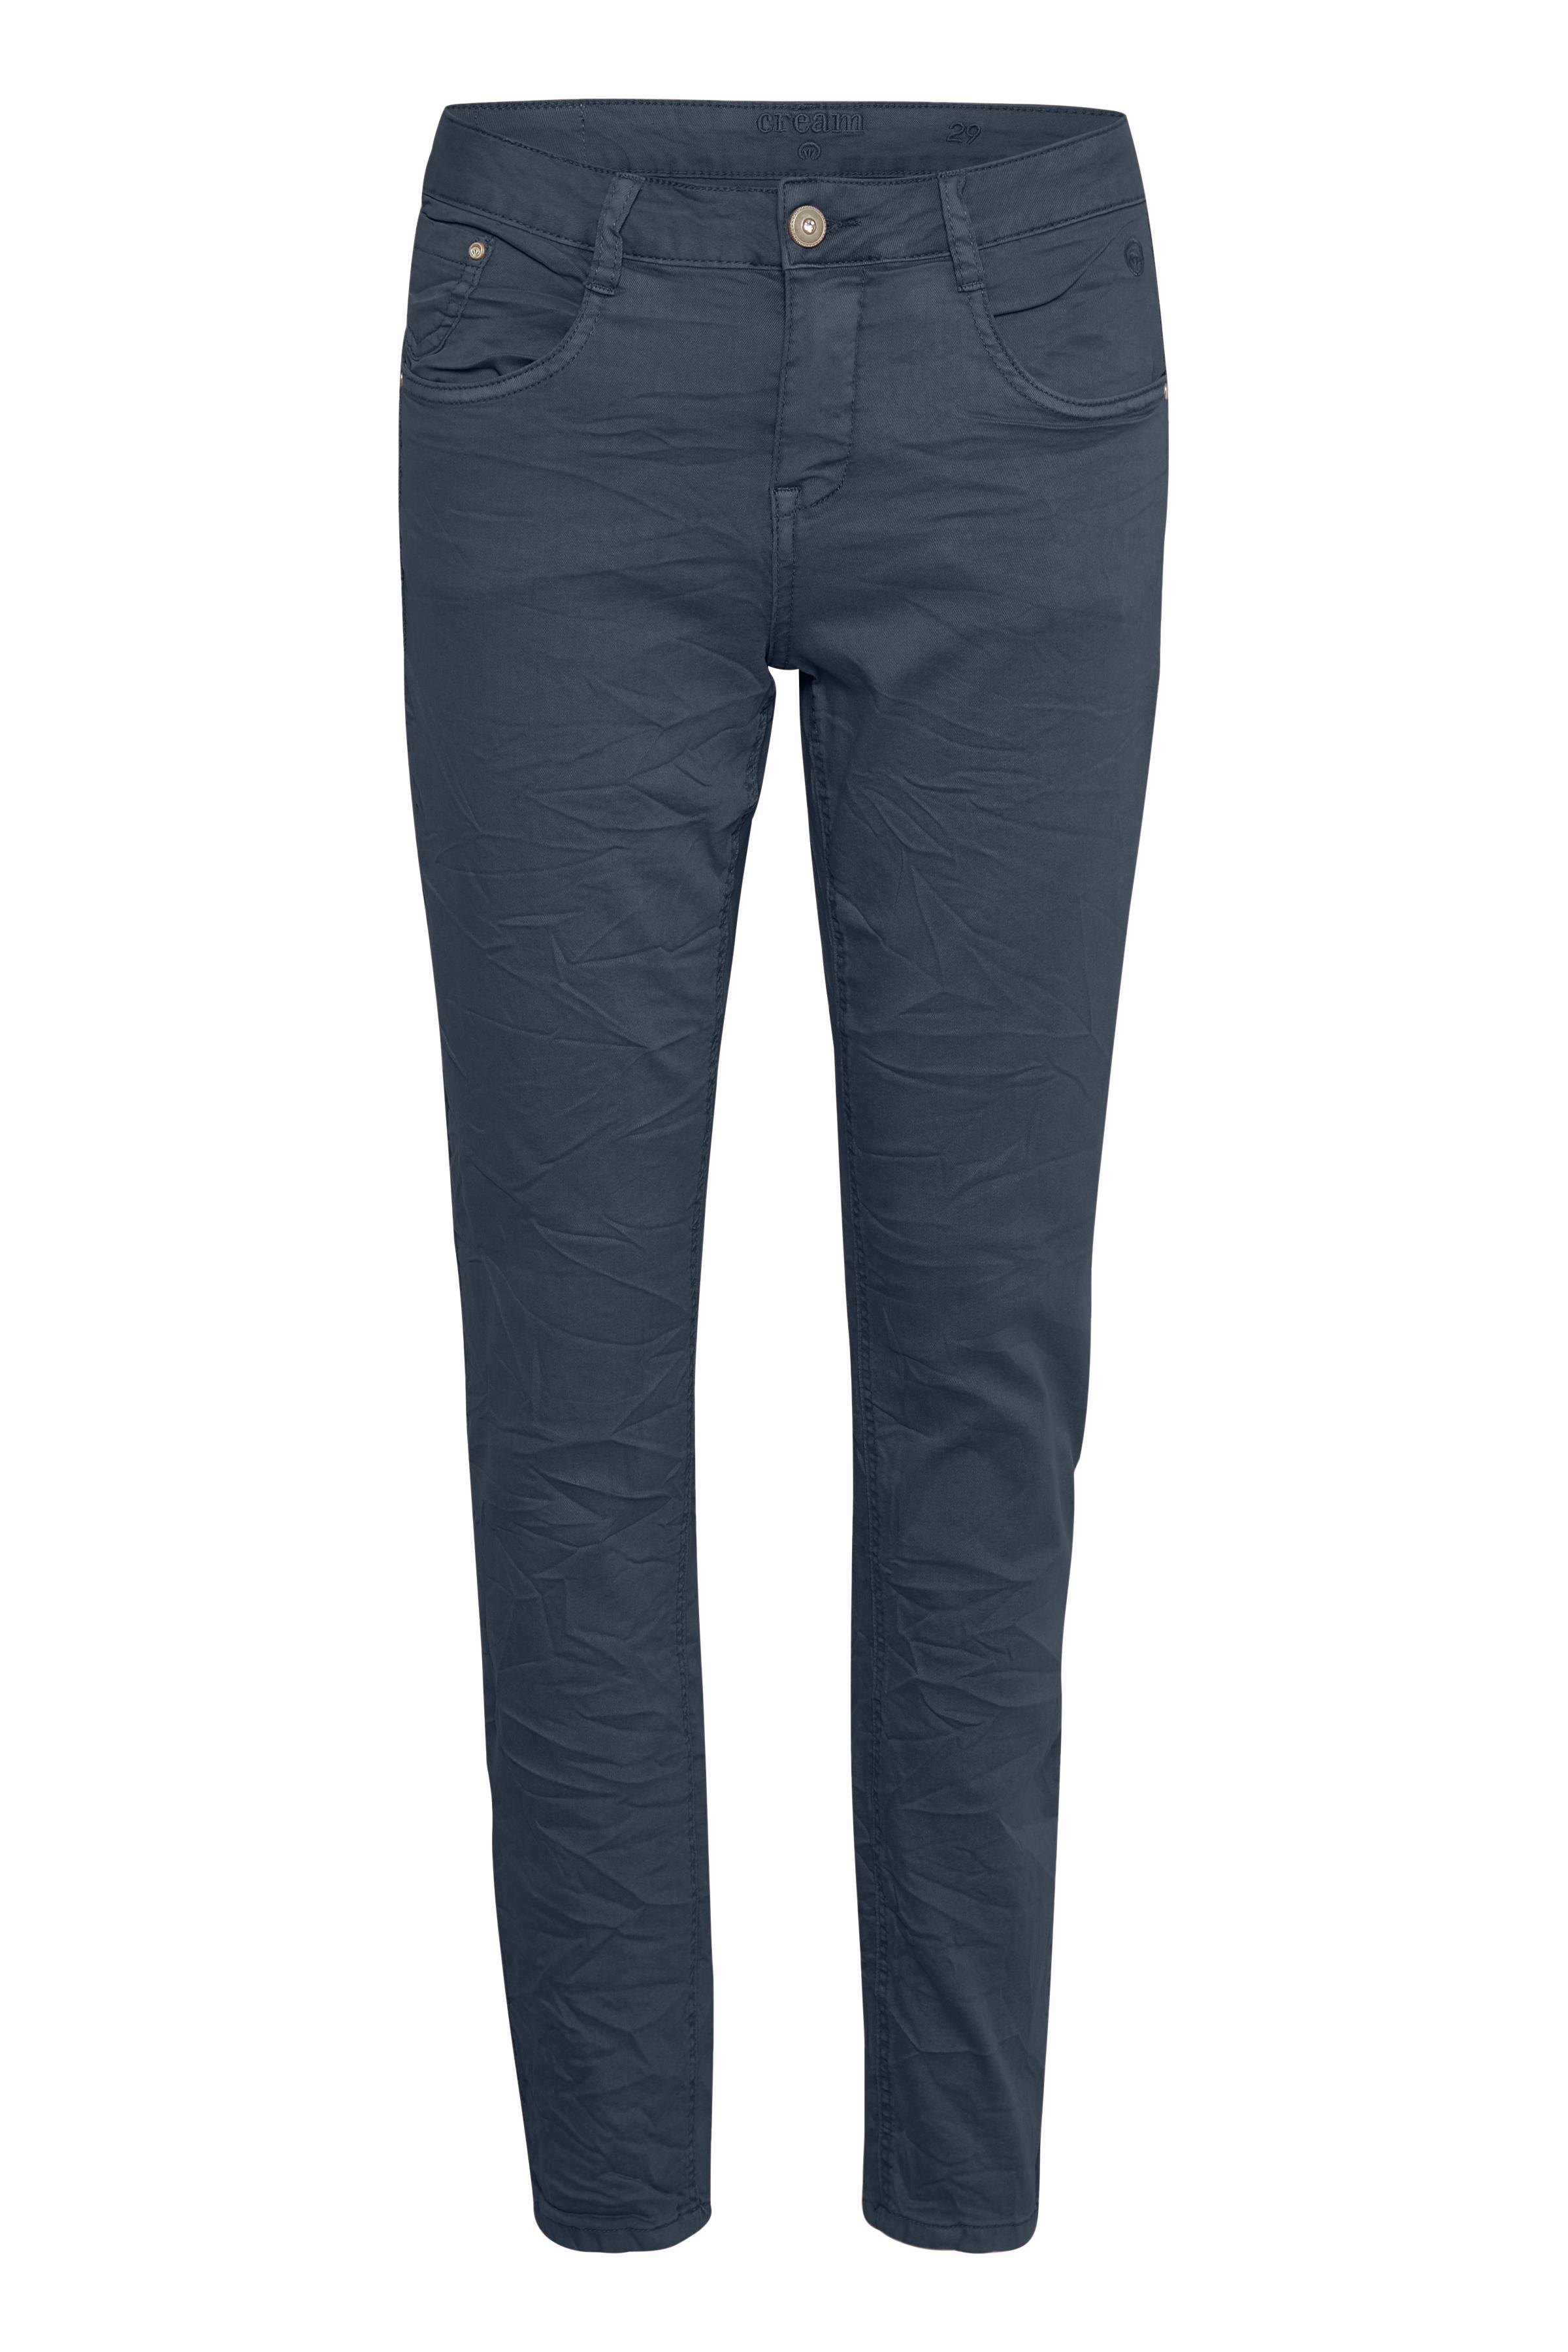 Cream Dame Normal pasformet Lotte jeans  - Marineblå